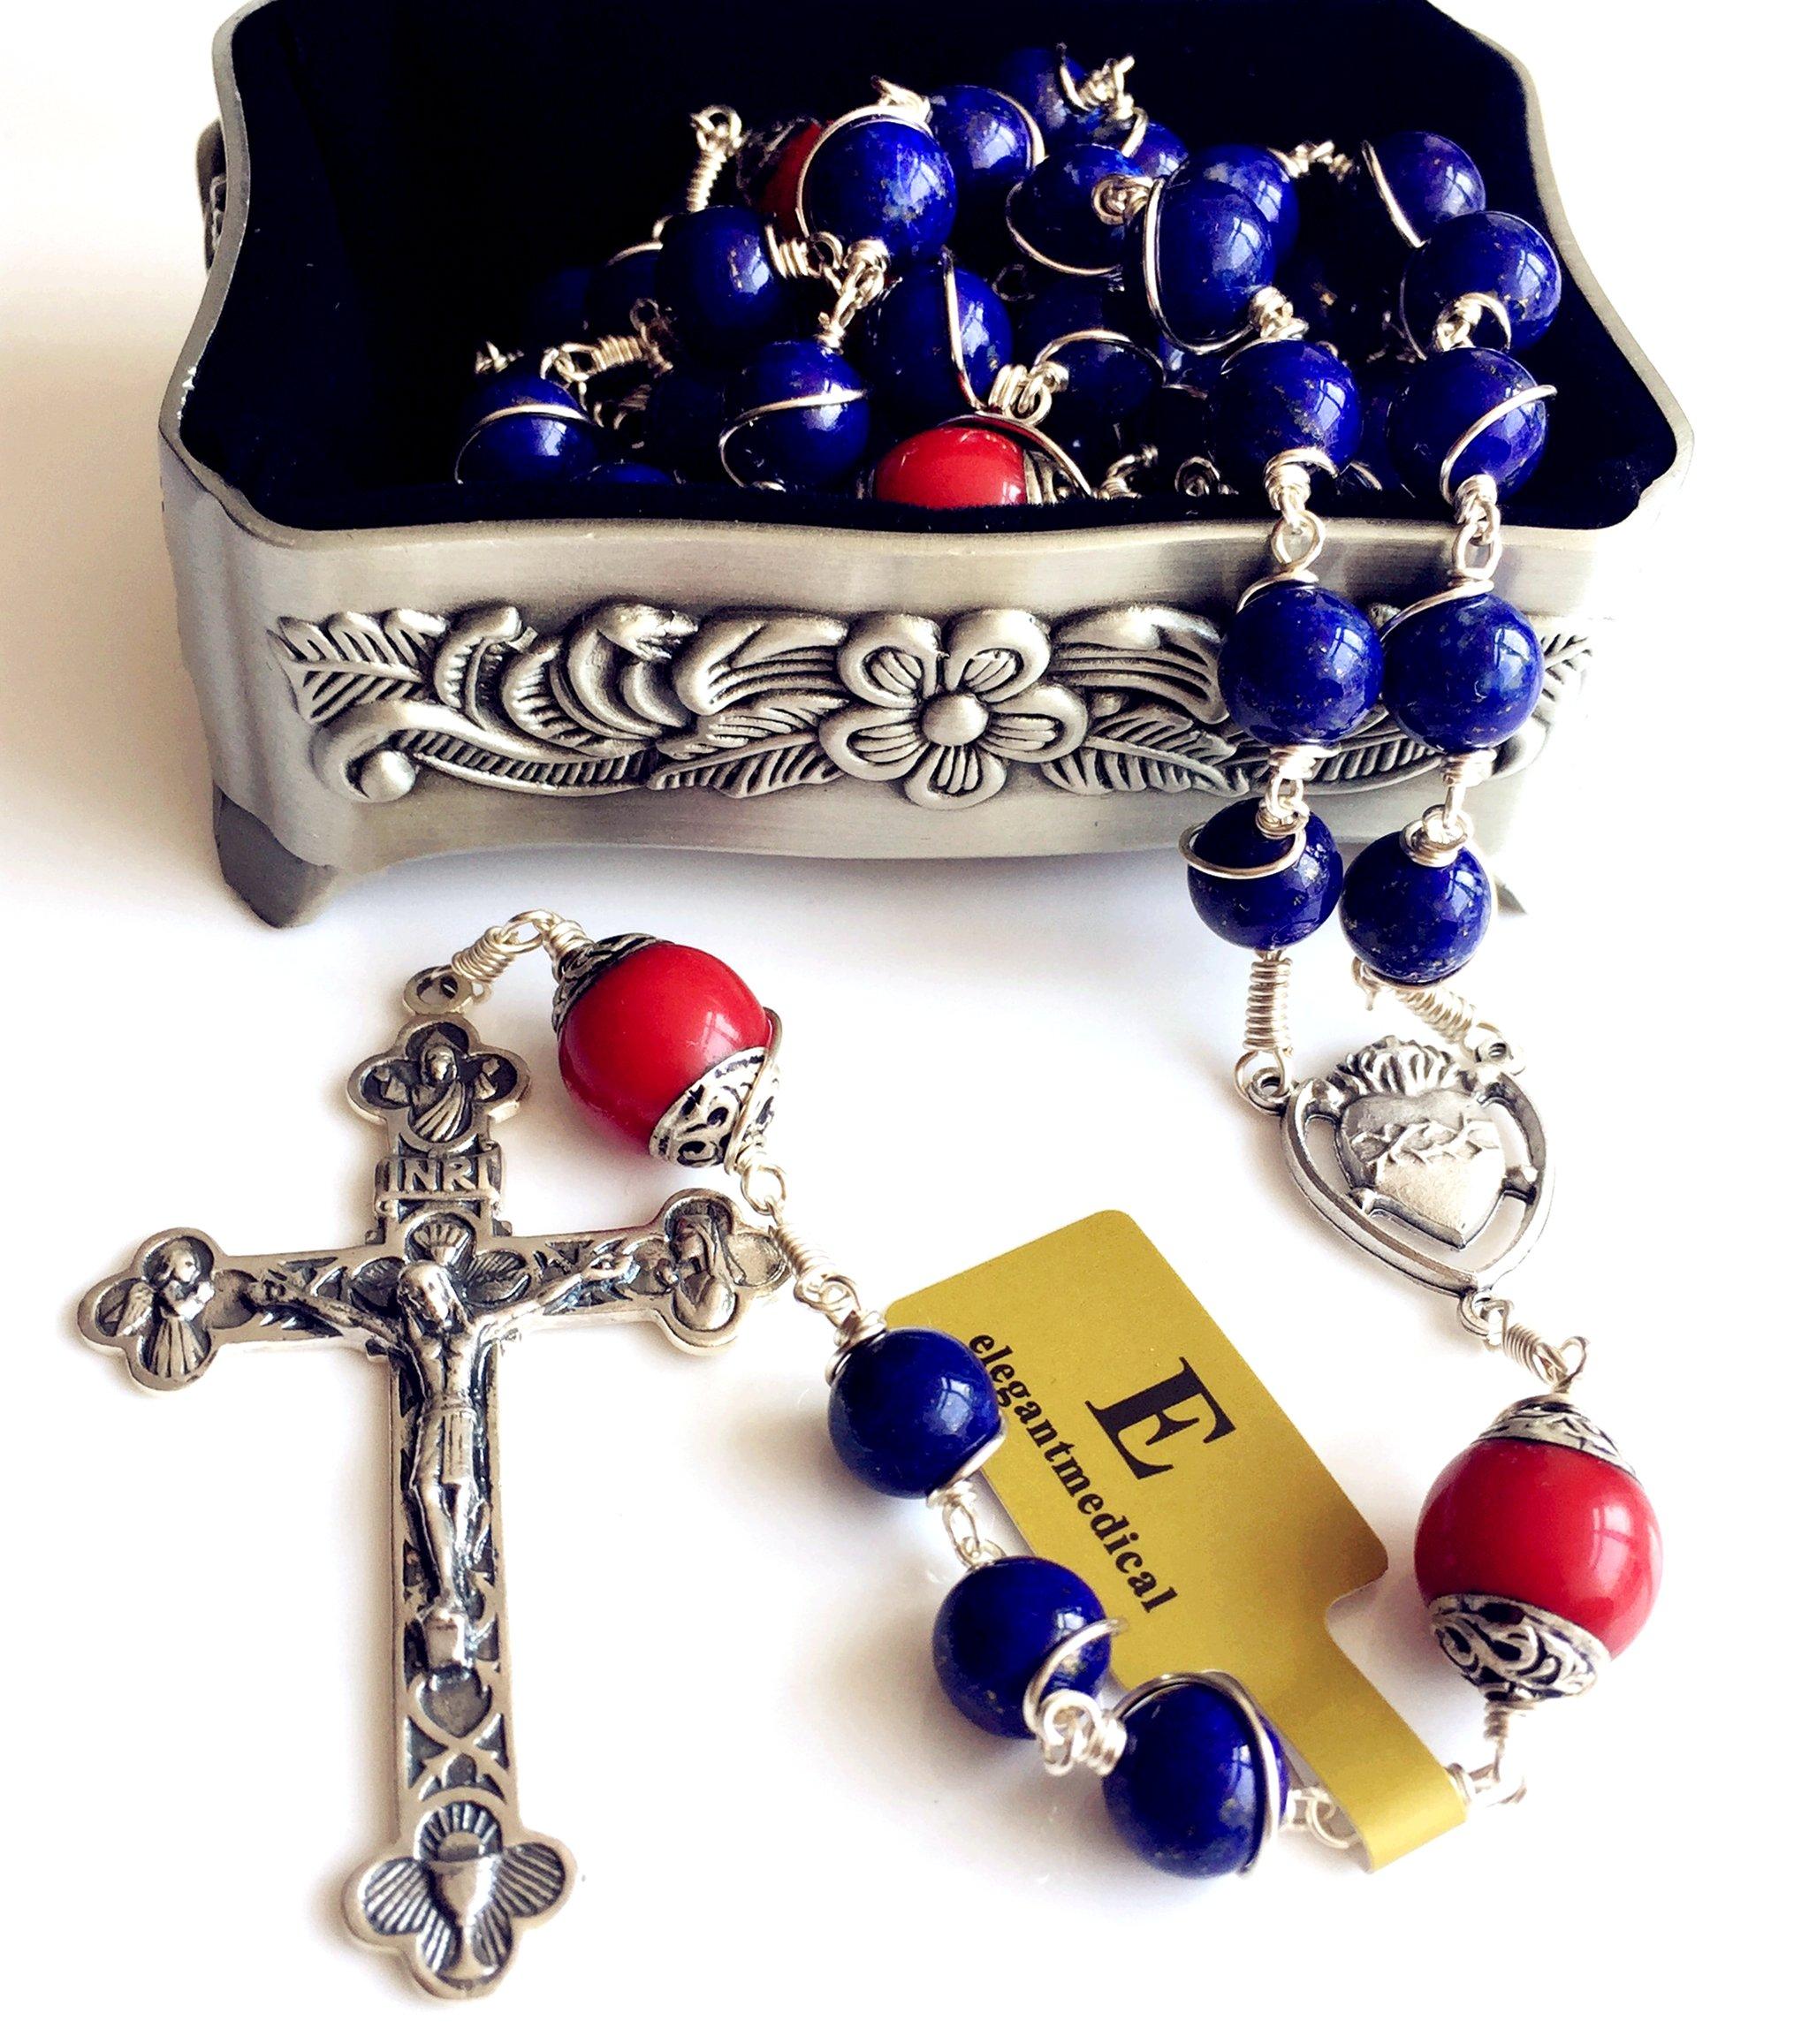 Handmade Sterling 925 Silver Lapis Lazuli Beads Rosary Cross Crucifix Catholic Necklace Gifts by elegantmedical (Image #1)